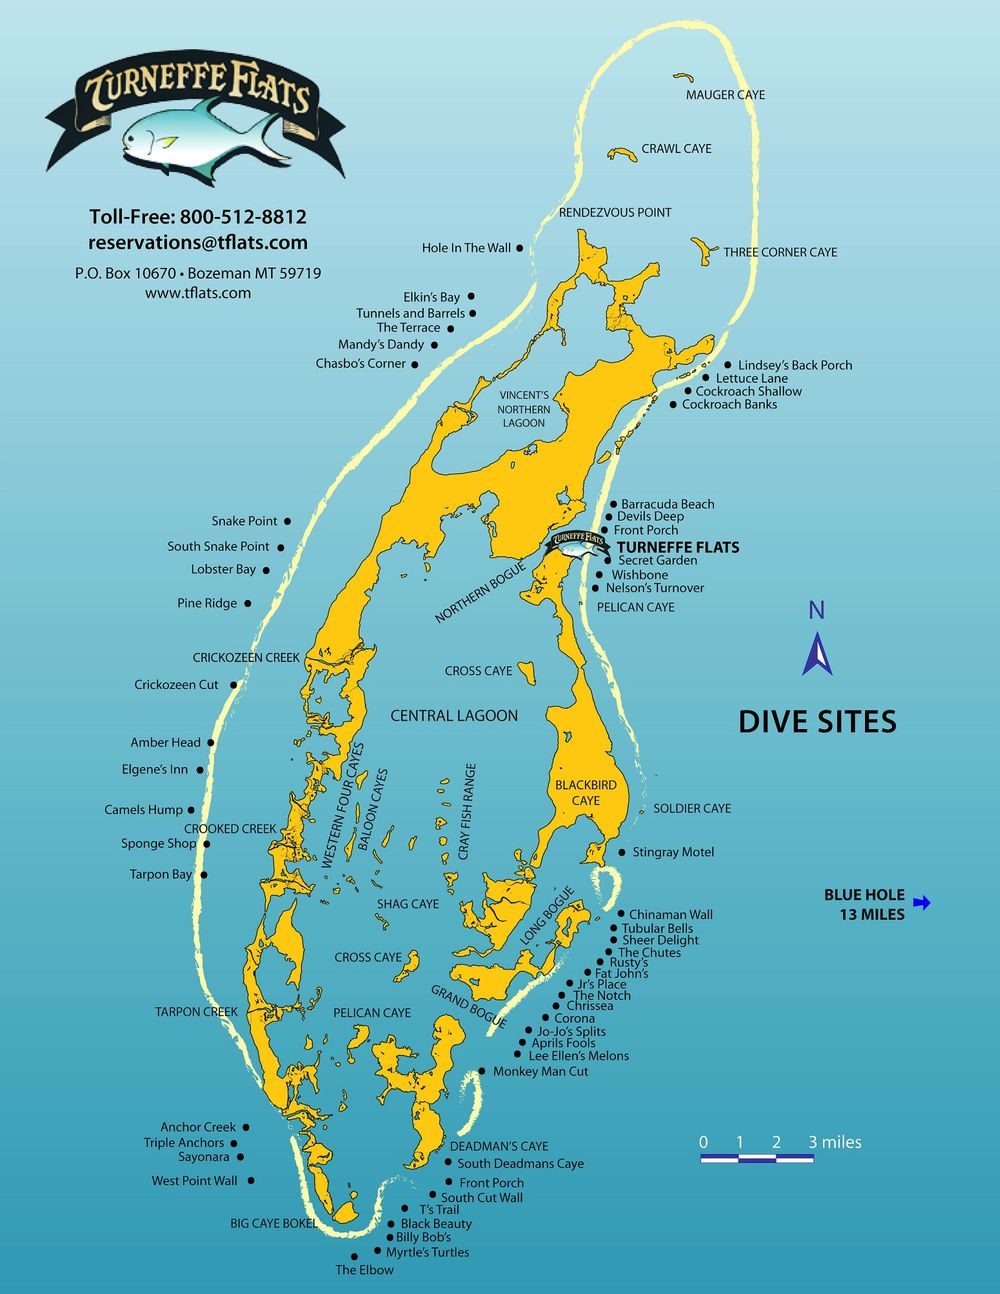 Turneffe Flats, Belize - Fly Fishing Belize